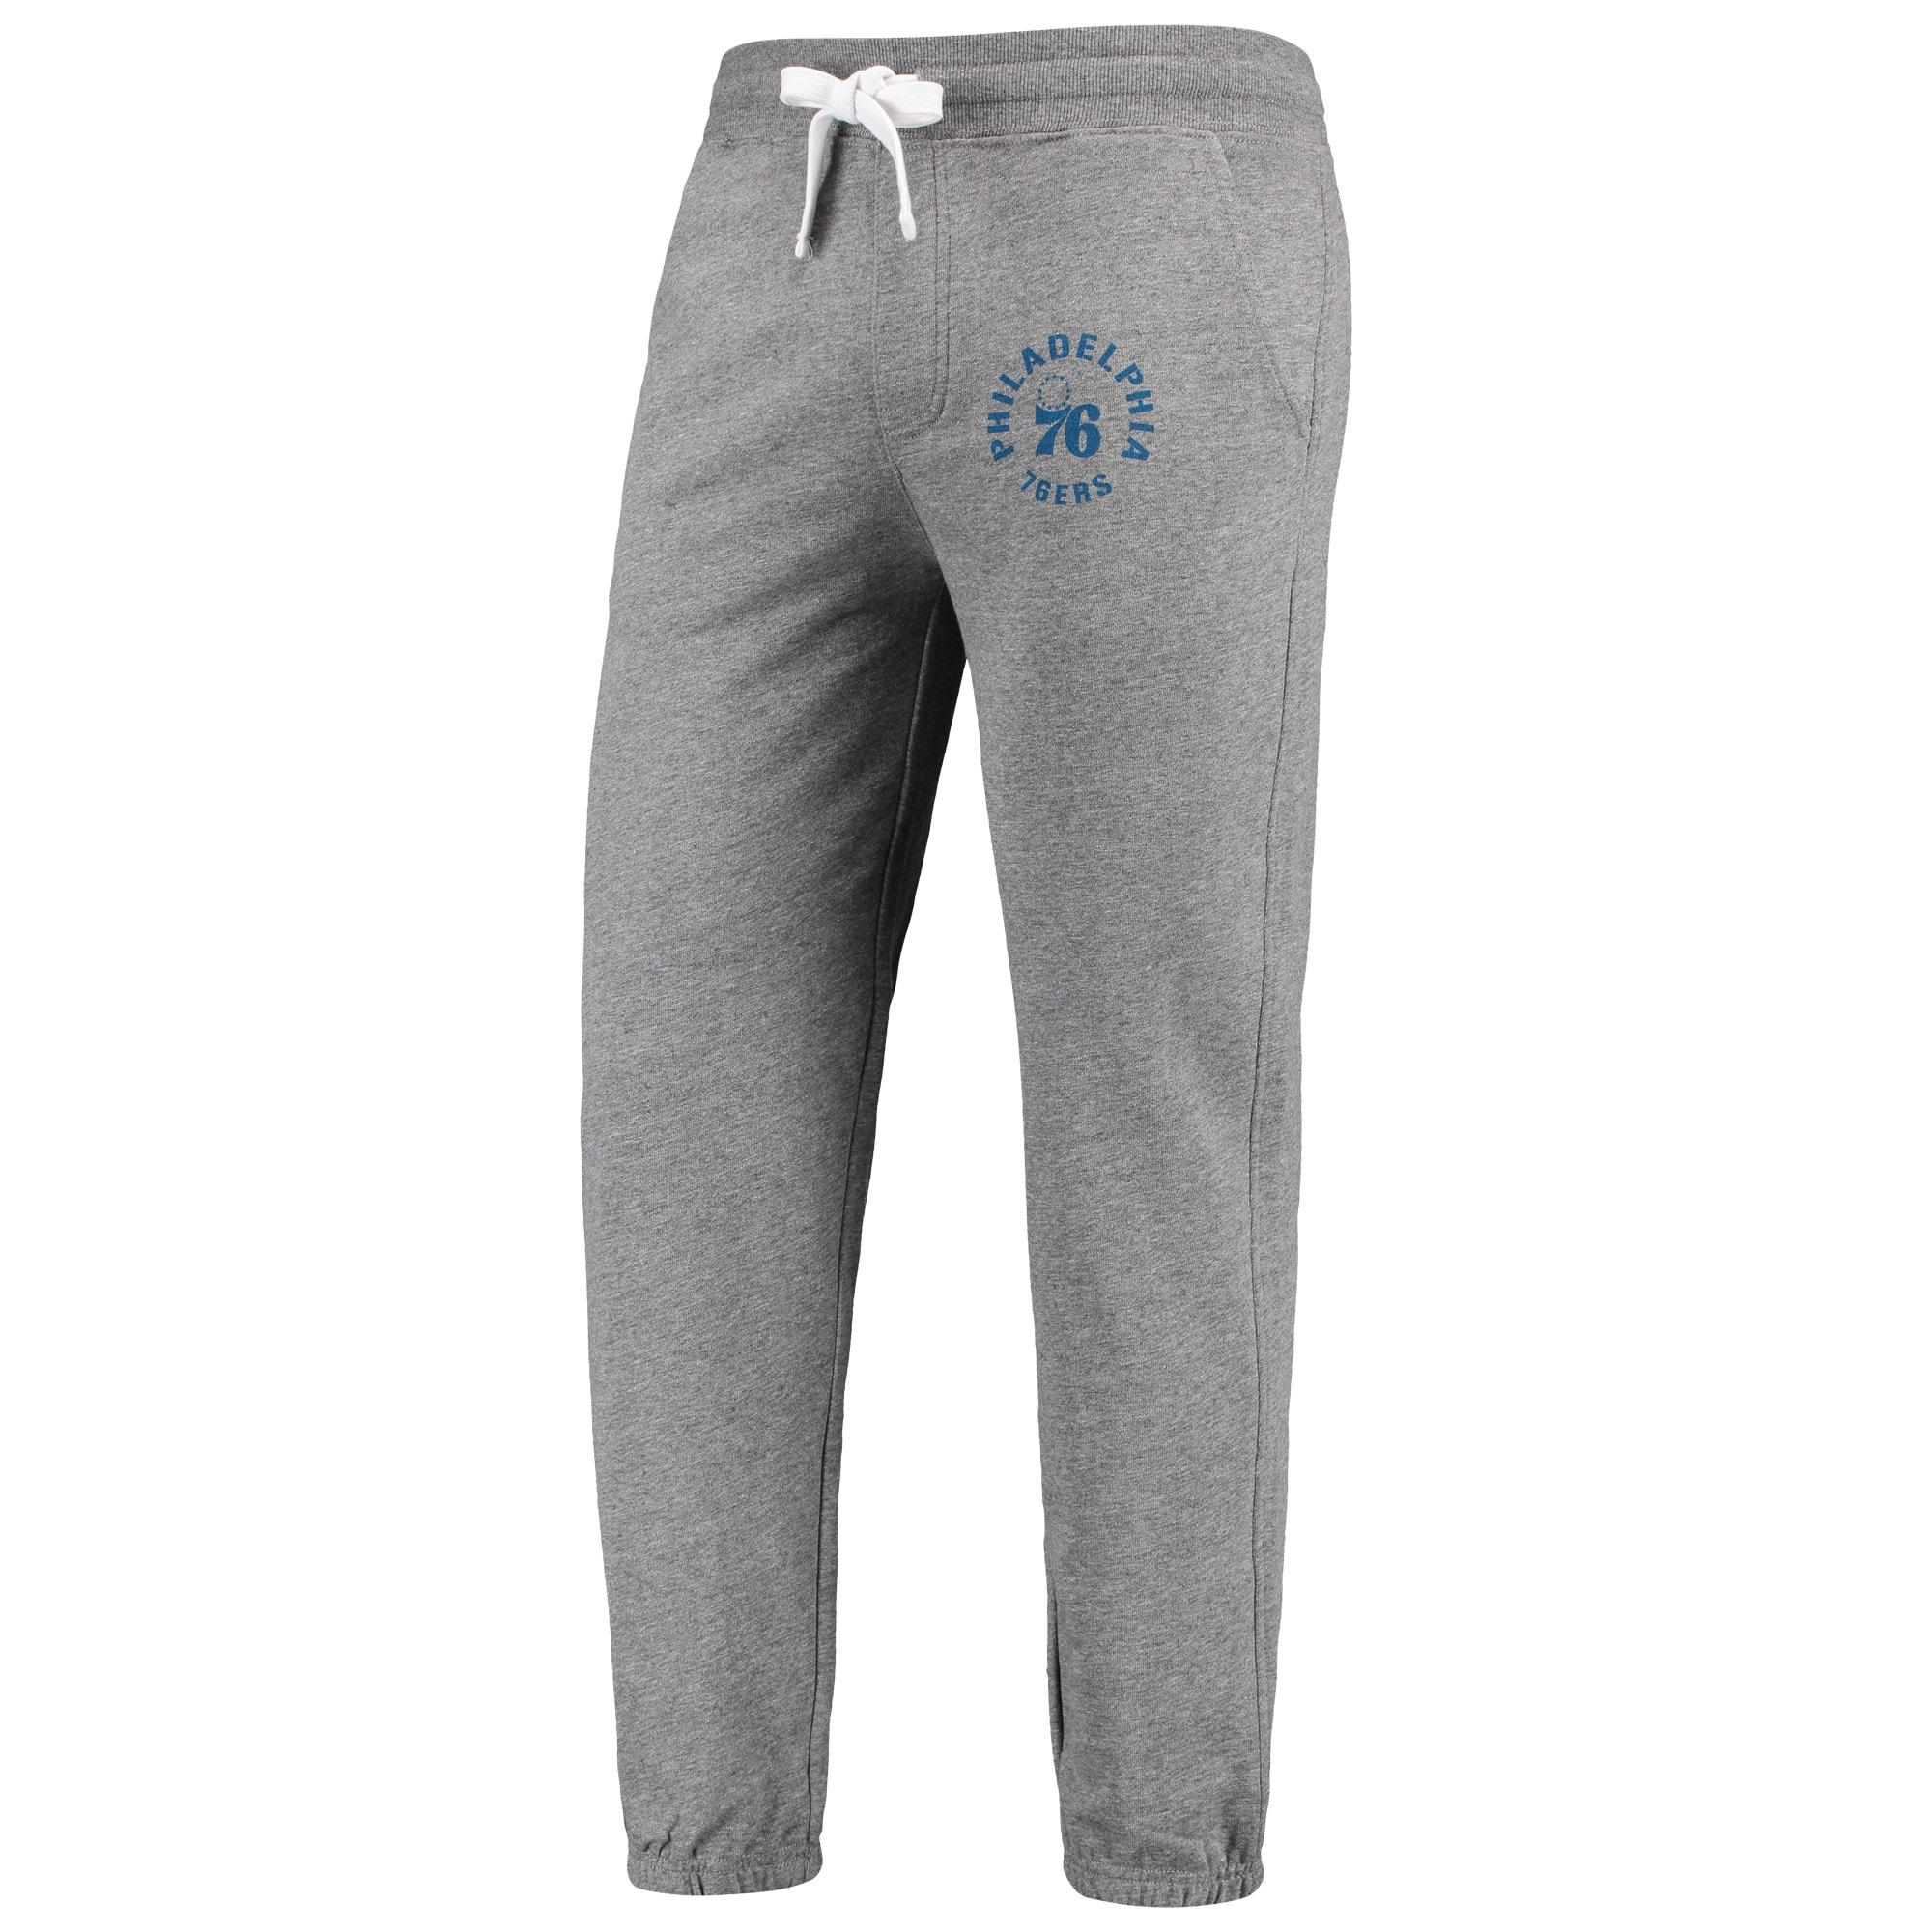 Philadelphia 76ers Sportiqe Quincy French Terry Classic Sweatpants - Gray